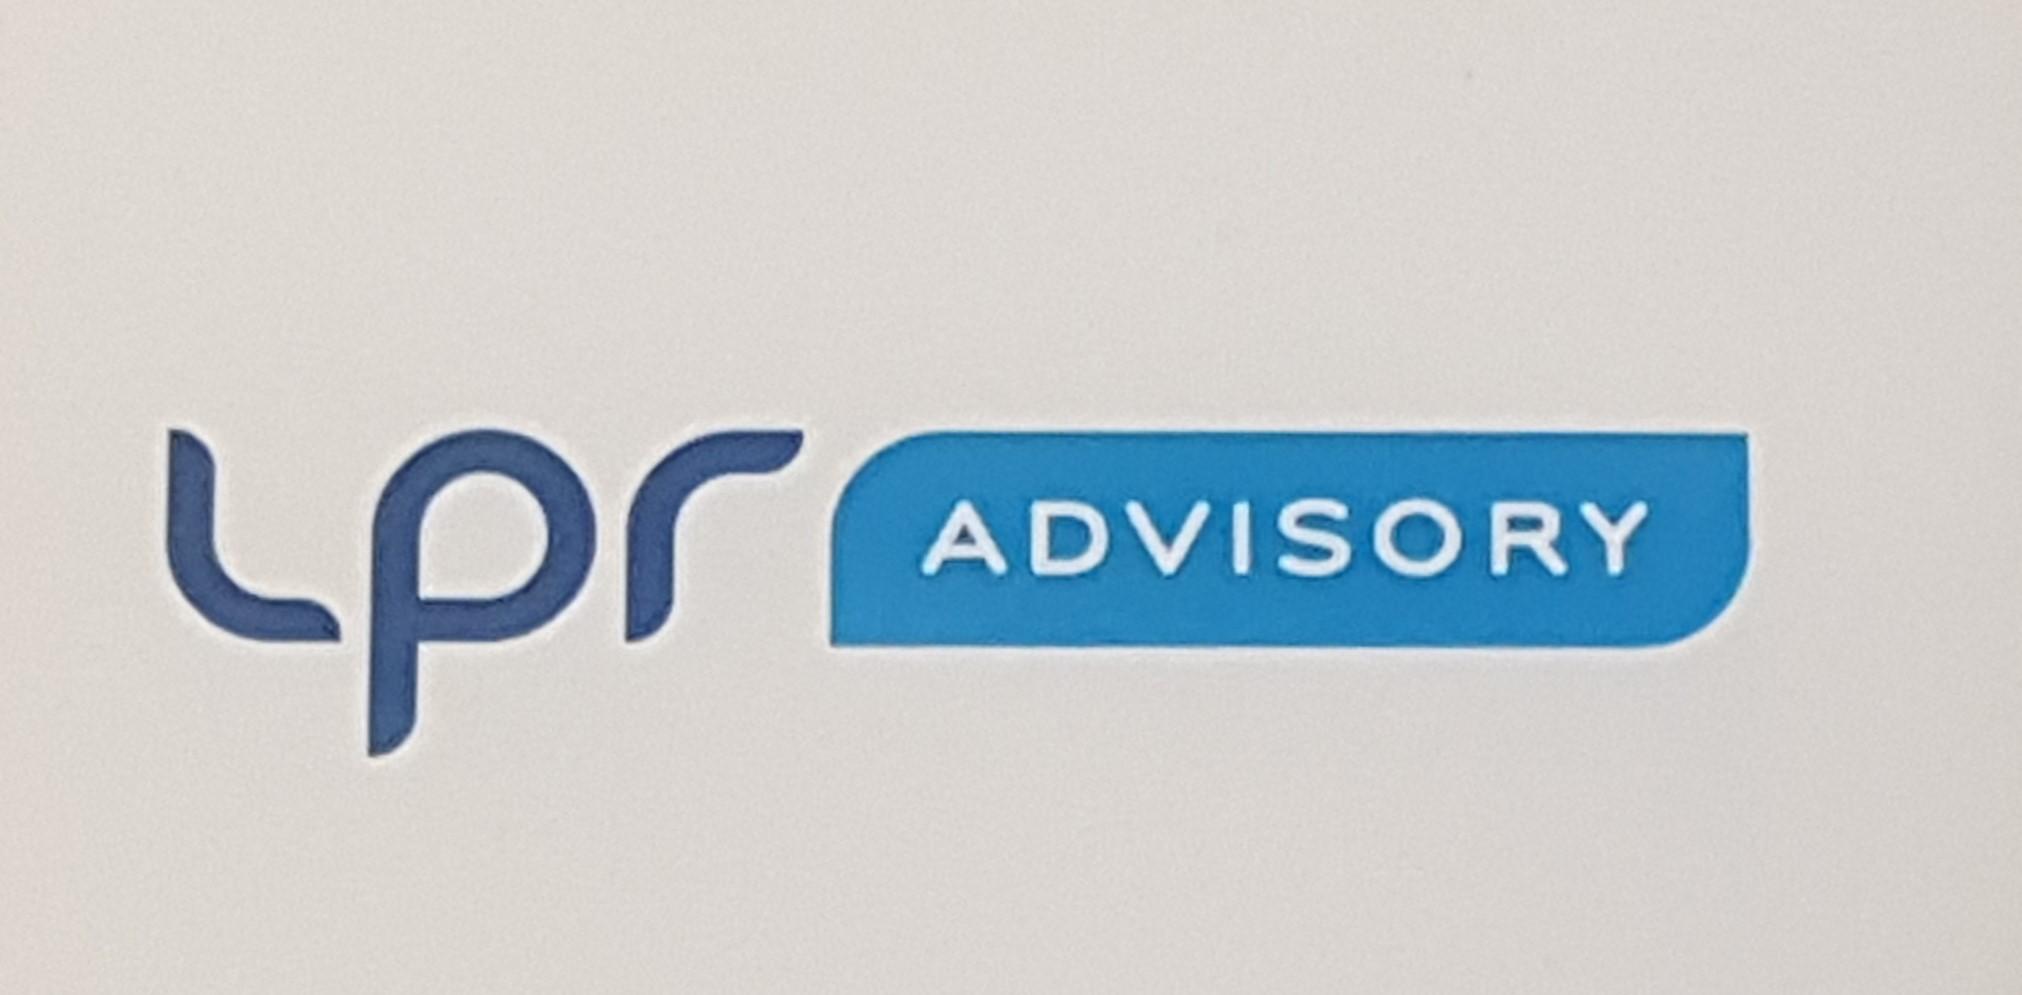 LPR Advisory